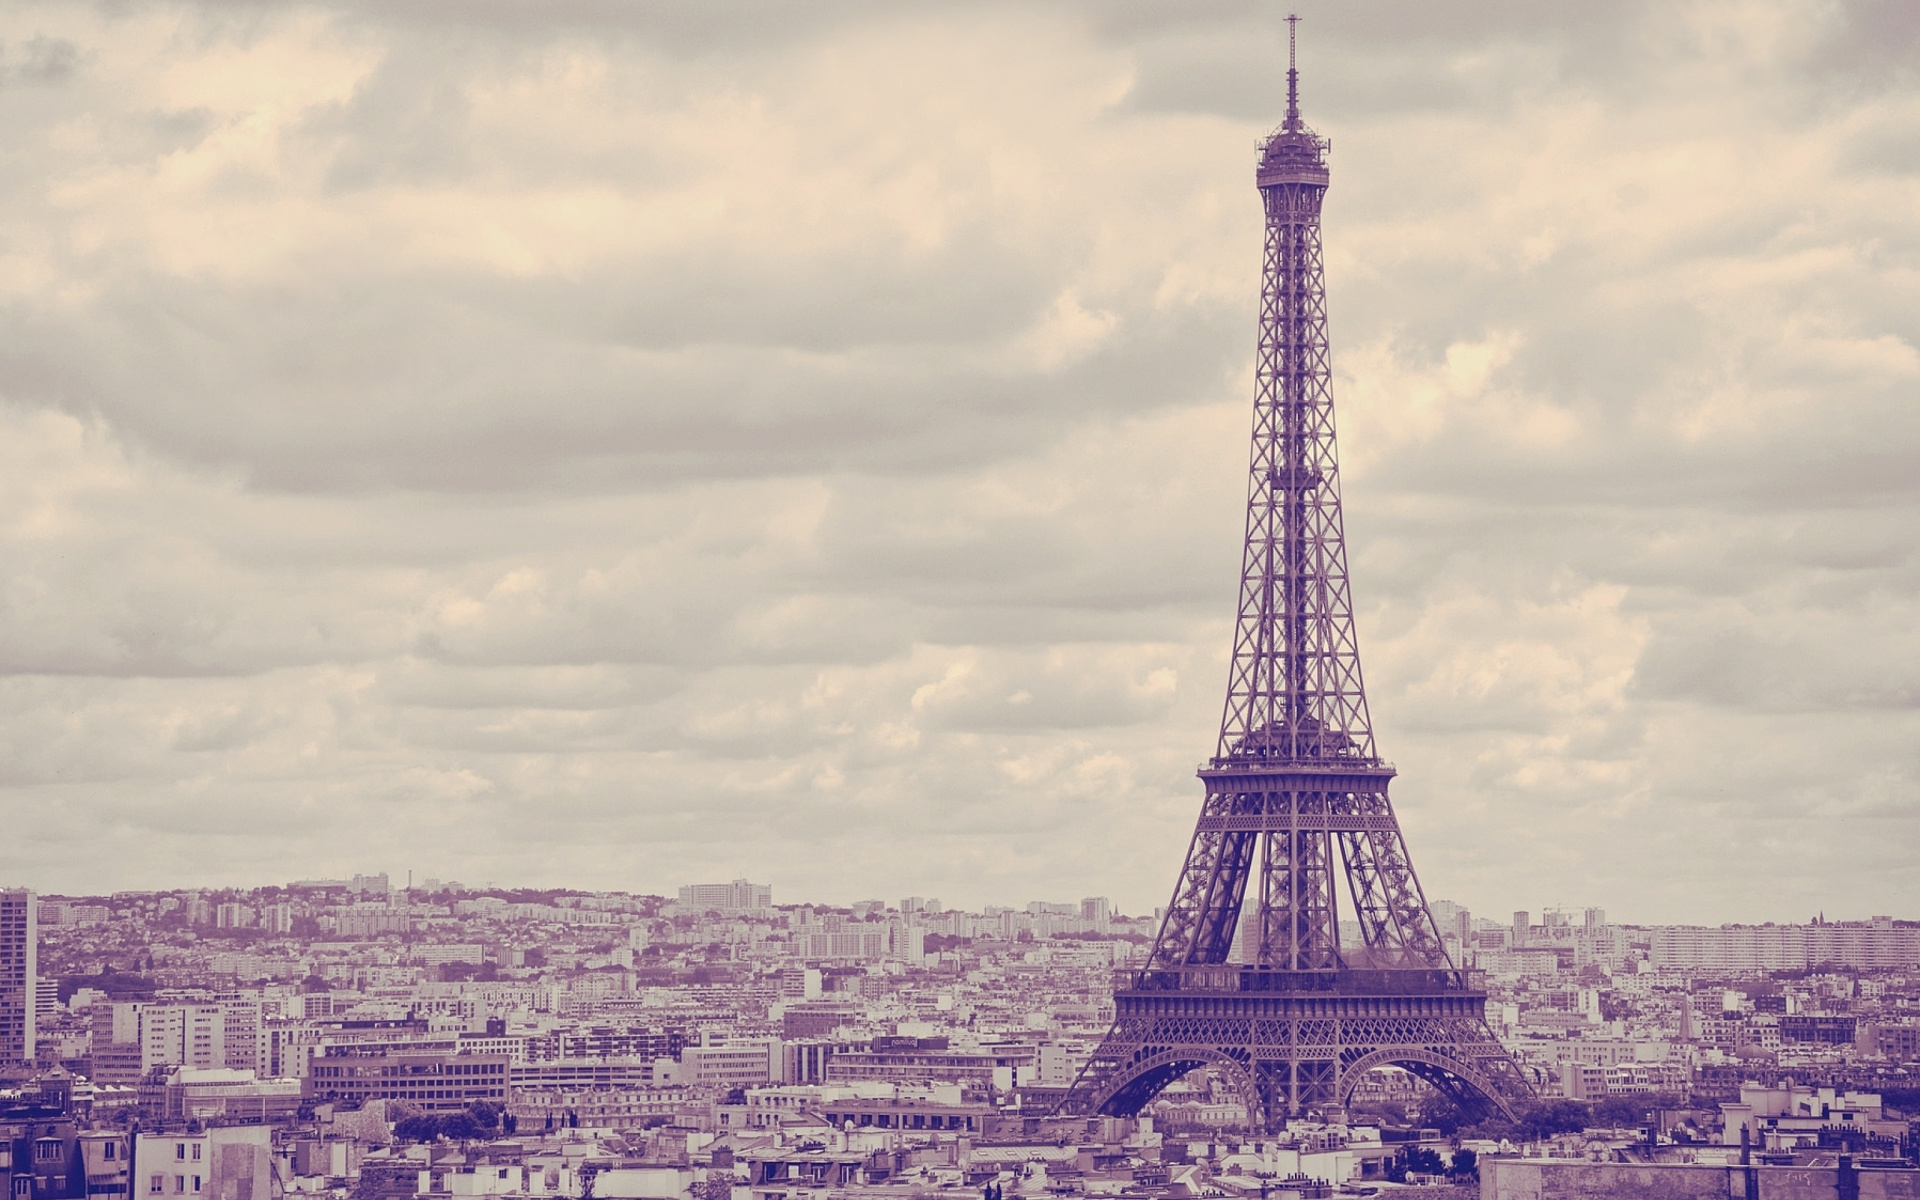 Torre Eiffel Dibujo Animado A Color: Eiffel Tower Landmark Color